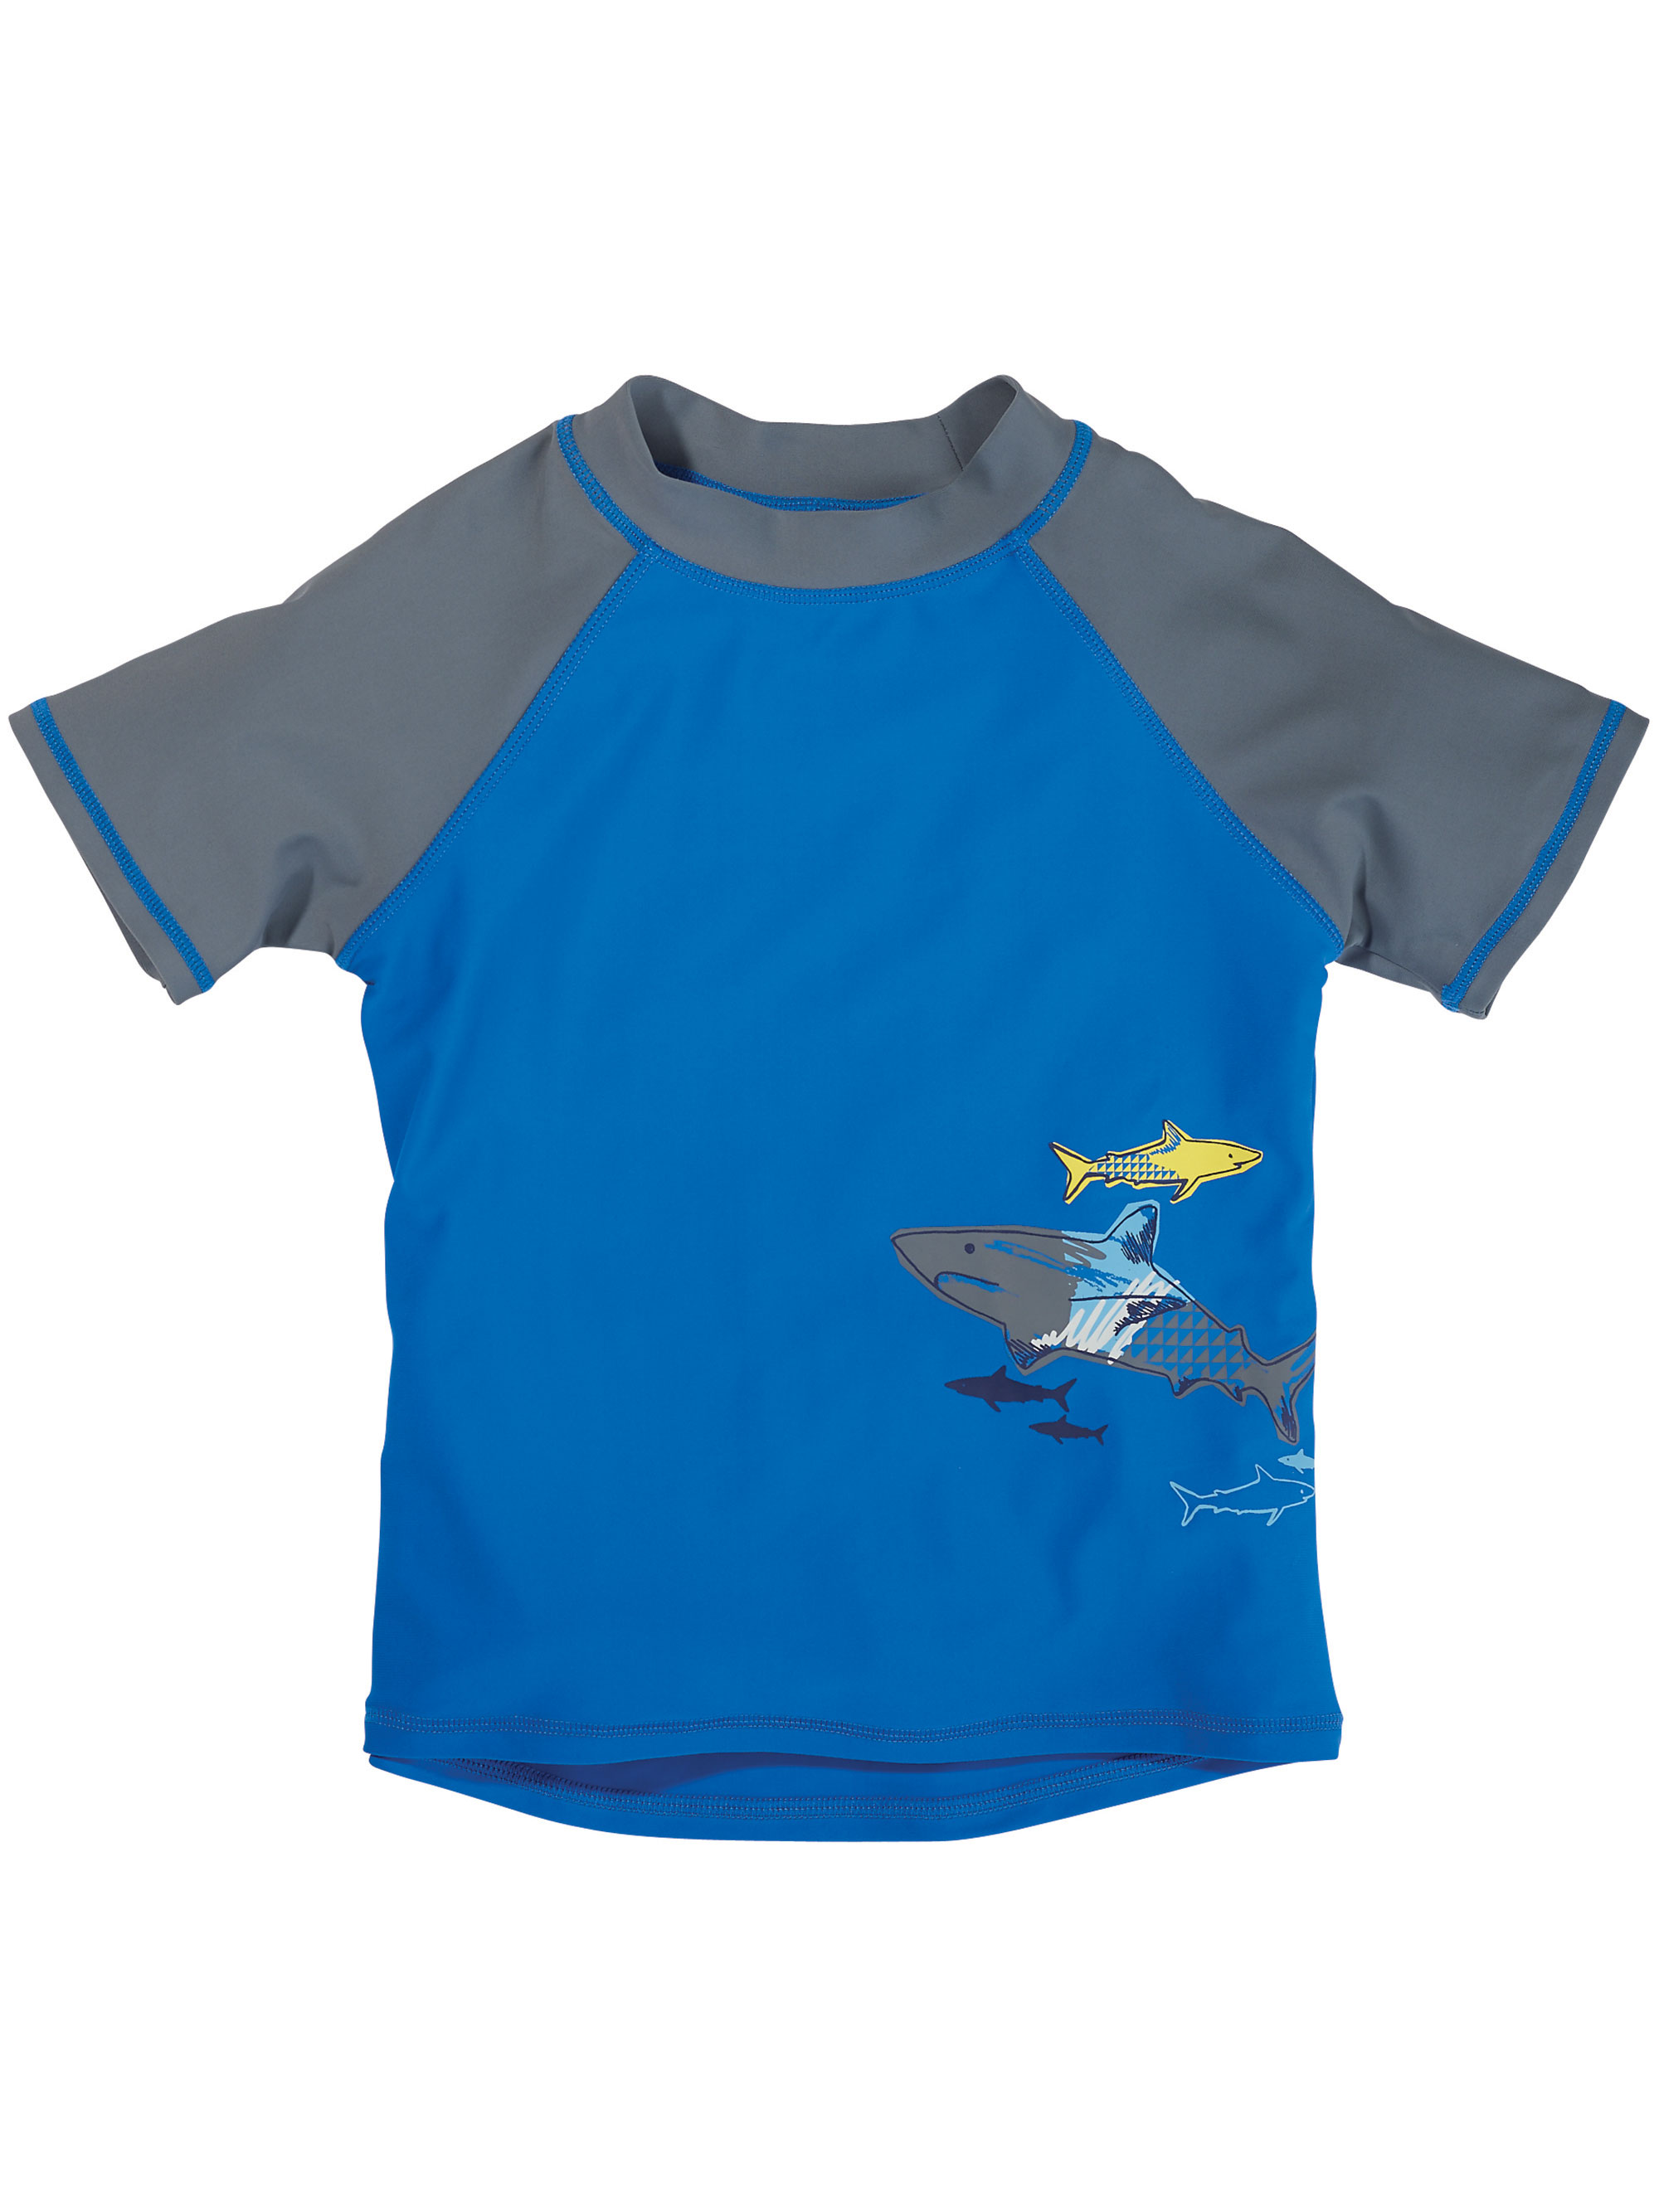 Sun Smarties Baby and Toddler Boy Rashguard - Blue and Gray with Shark Design - UPF 50+ Short Sleeve Swim Shirt